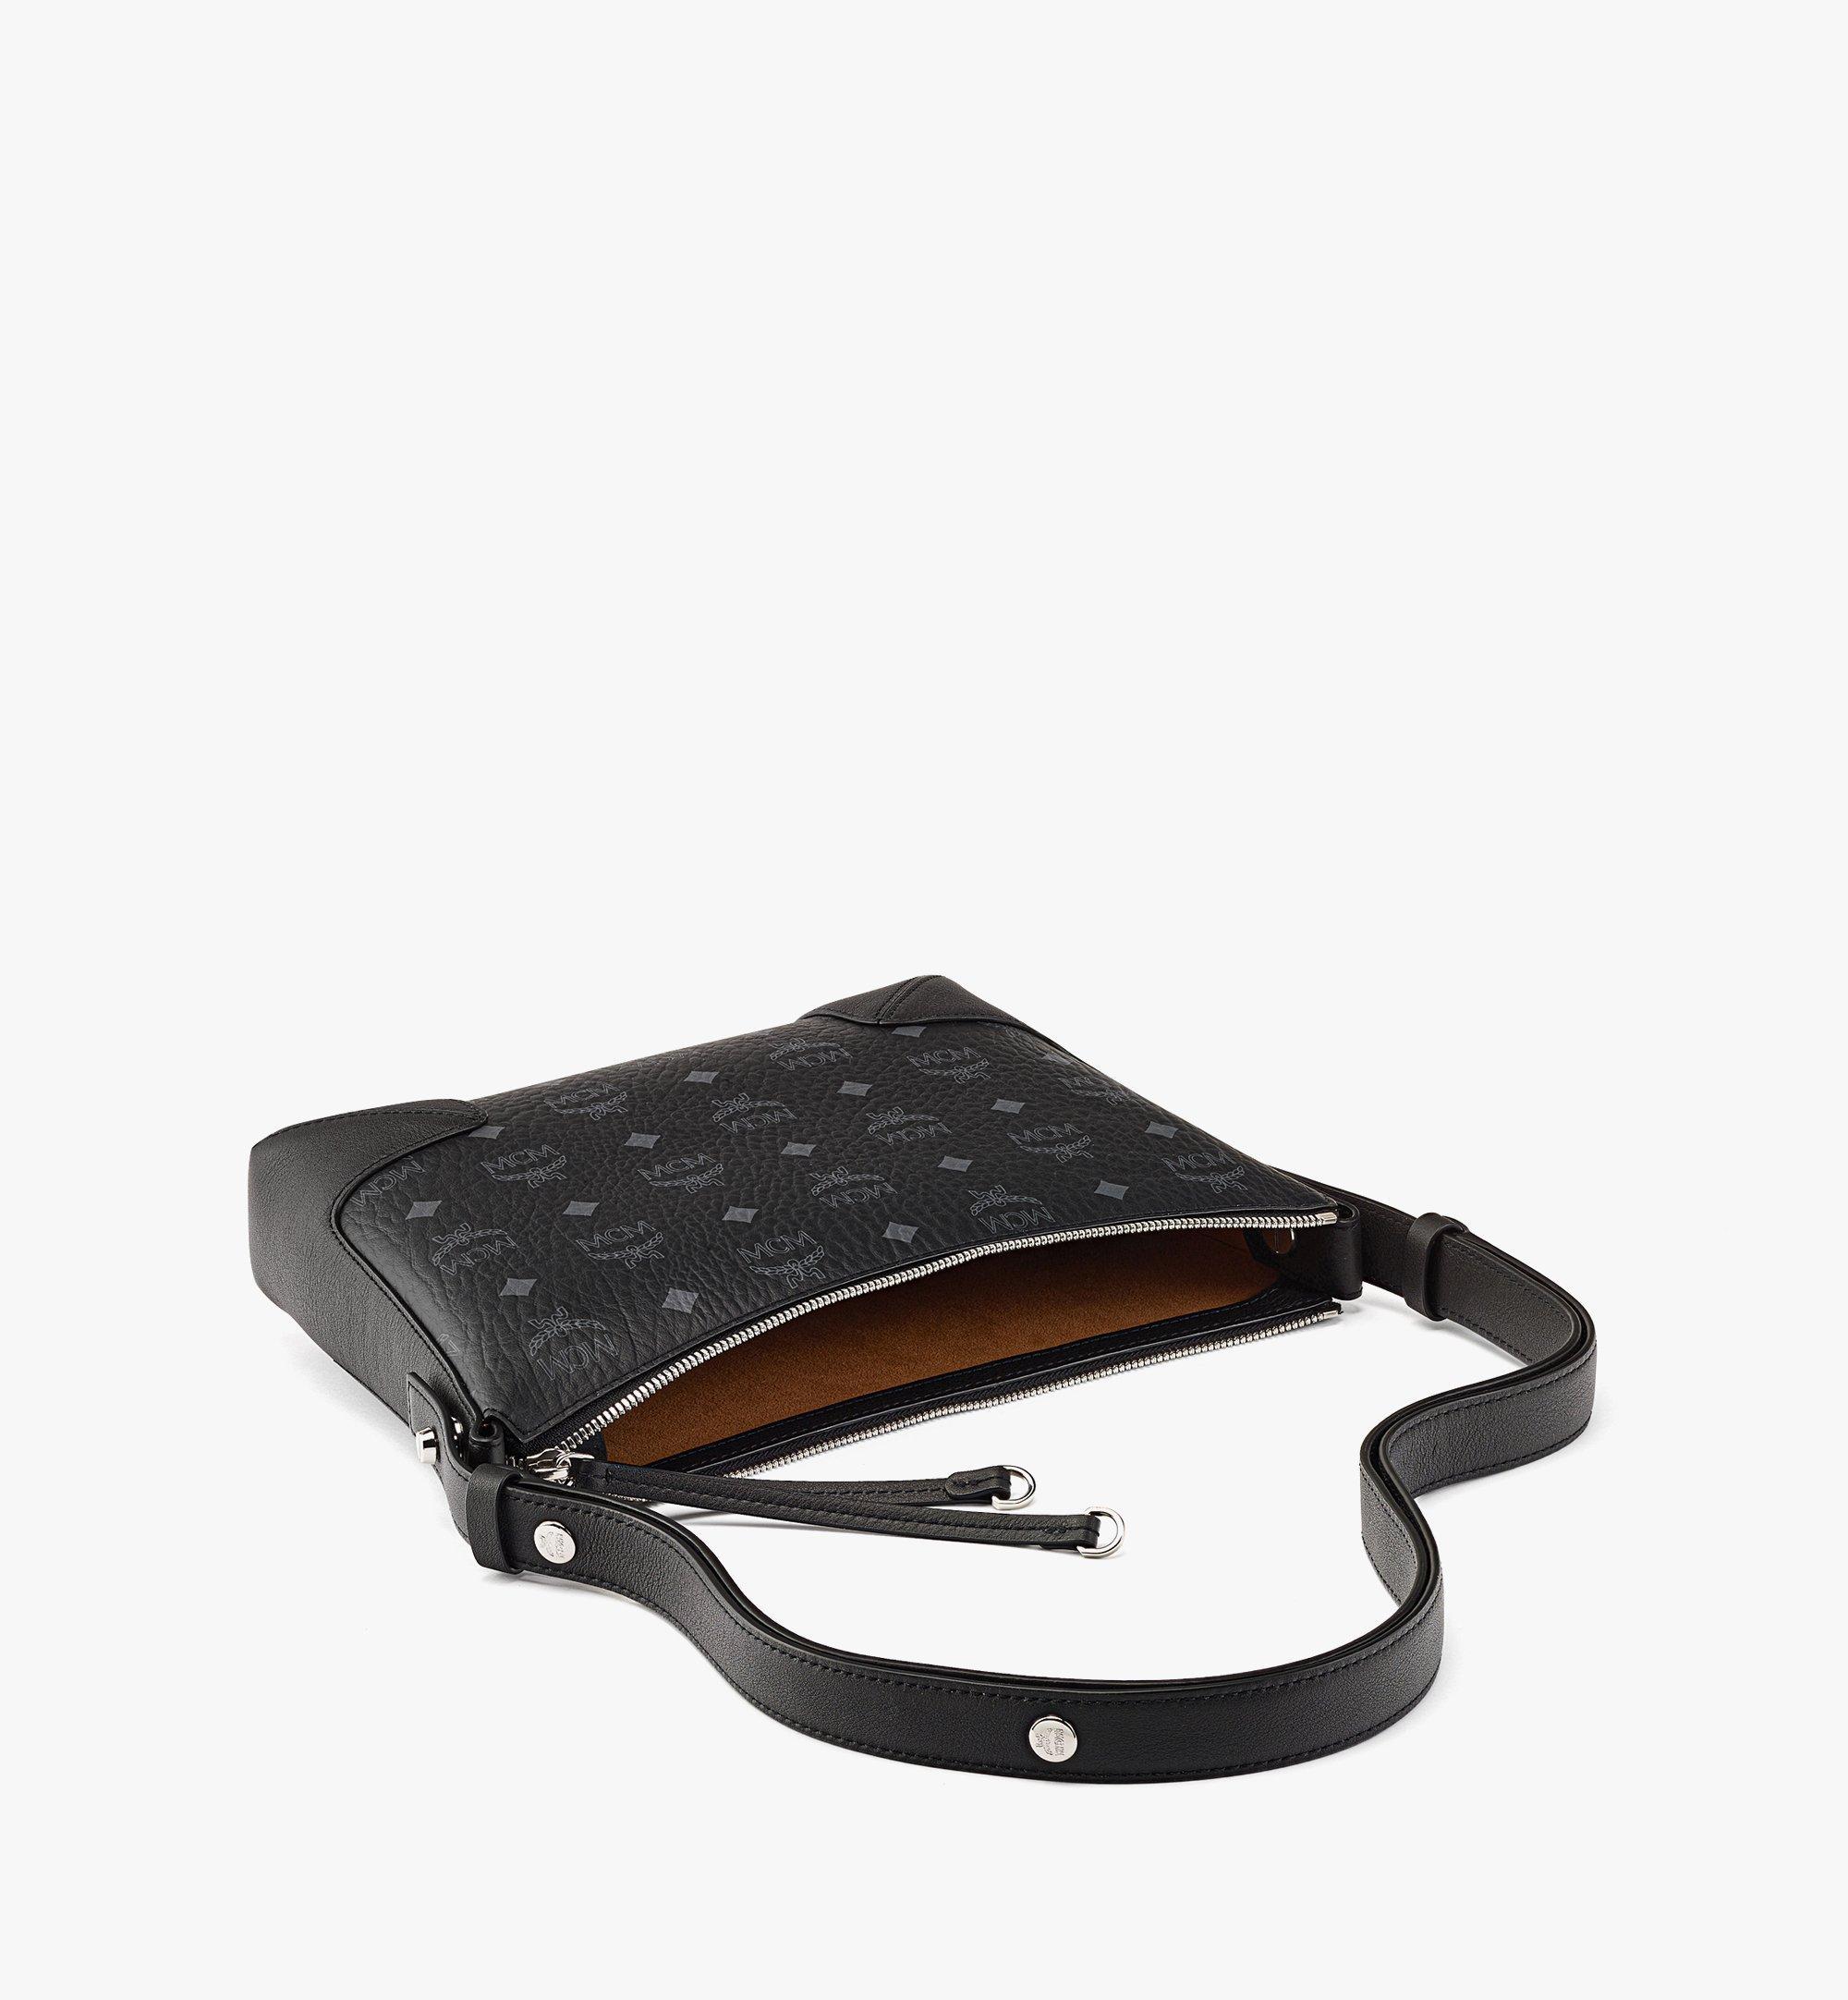 MCM Klara Shoulder Bag in Visetos Black MWSBSKM01BK001 Alternate View 2